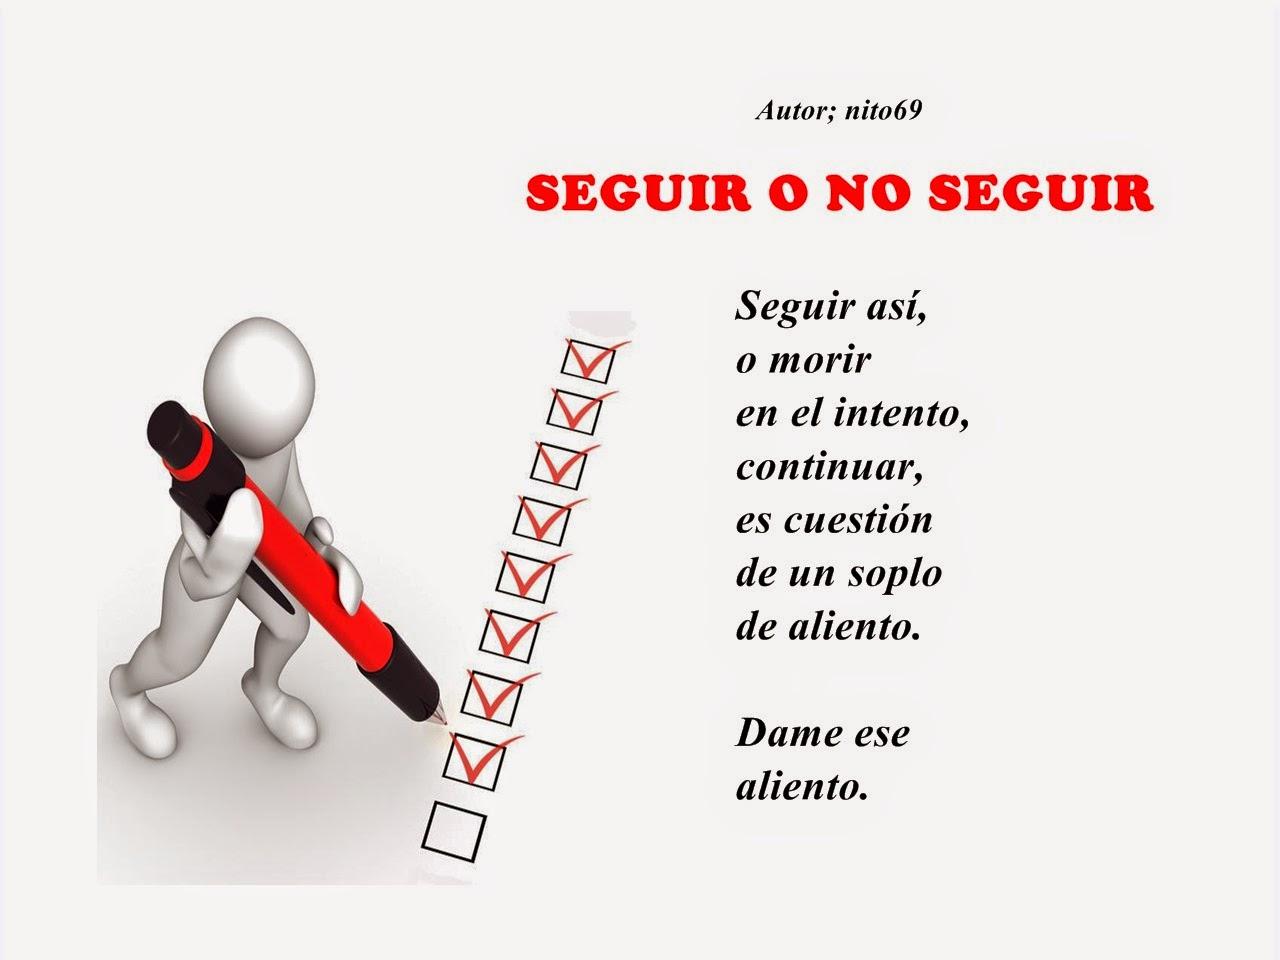 SEGUIR O NO SEGUIR